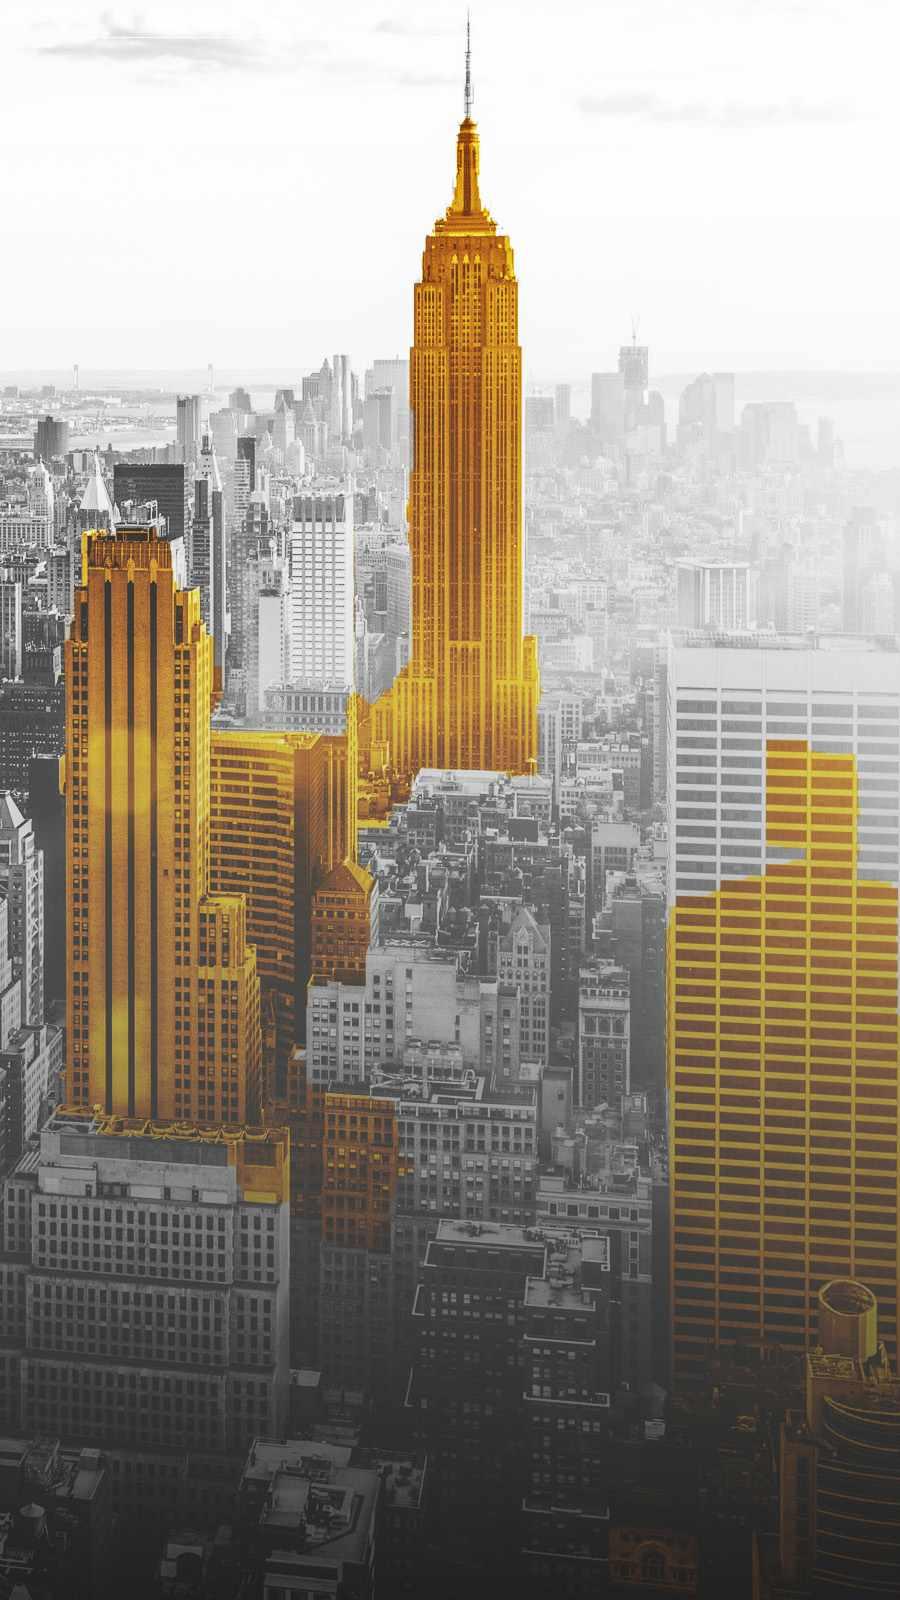 Golden New York iPhone Wallpaper